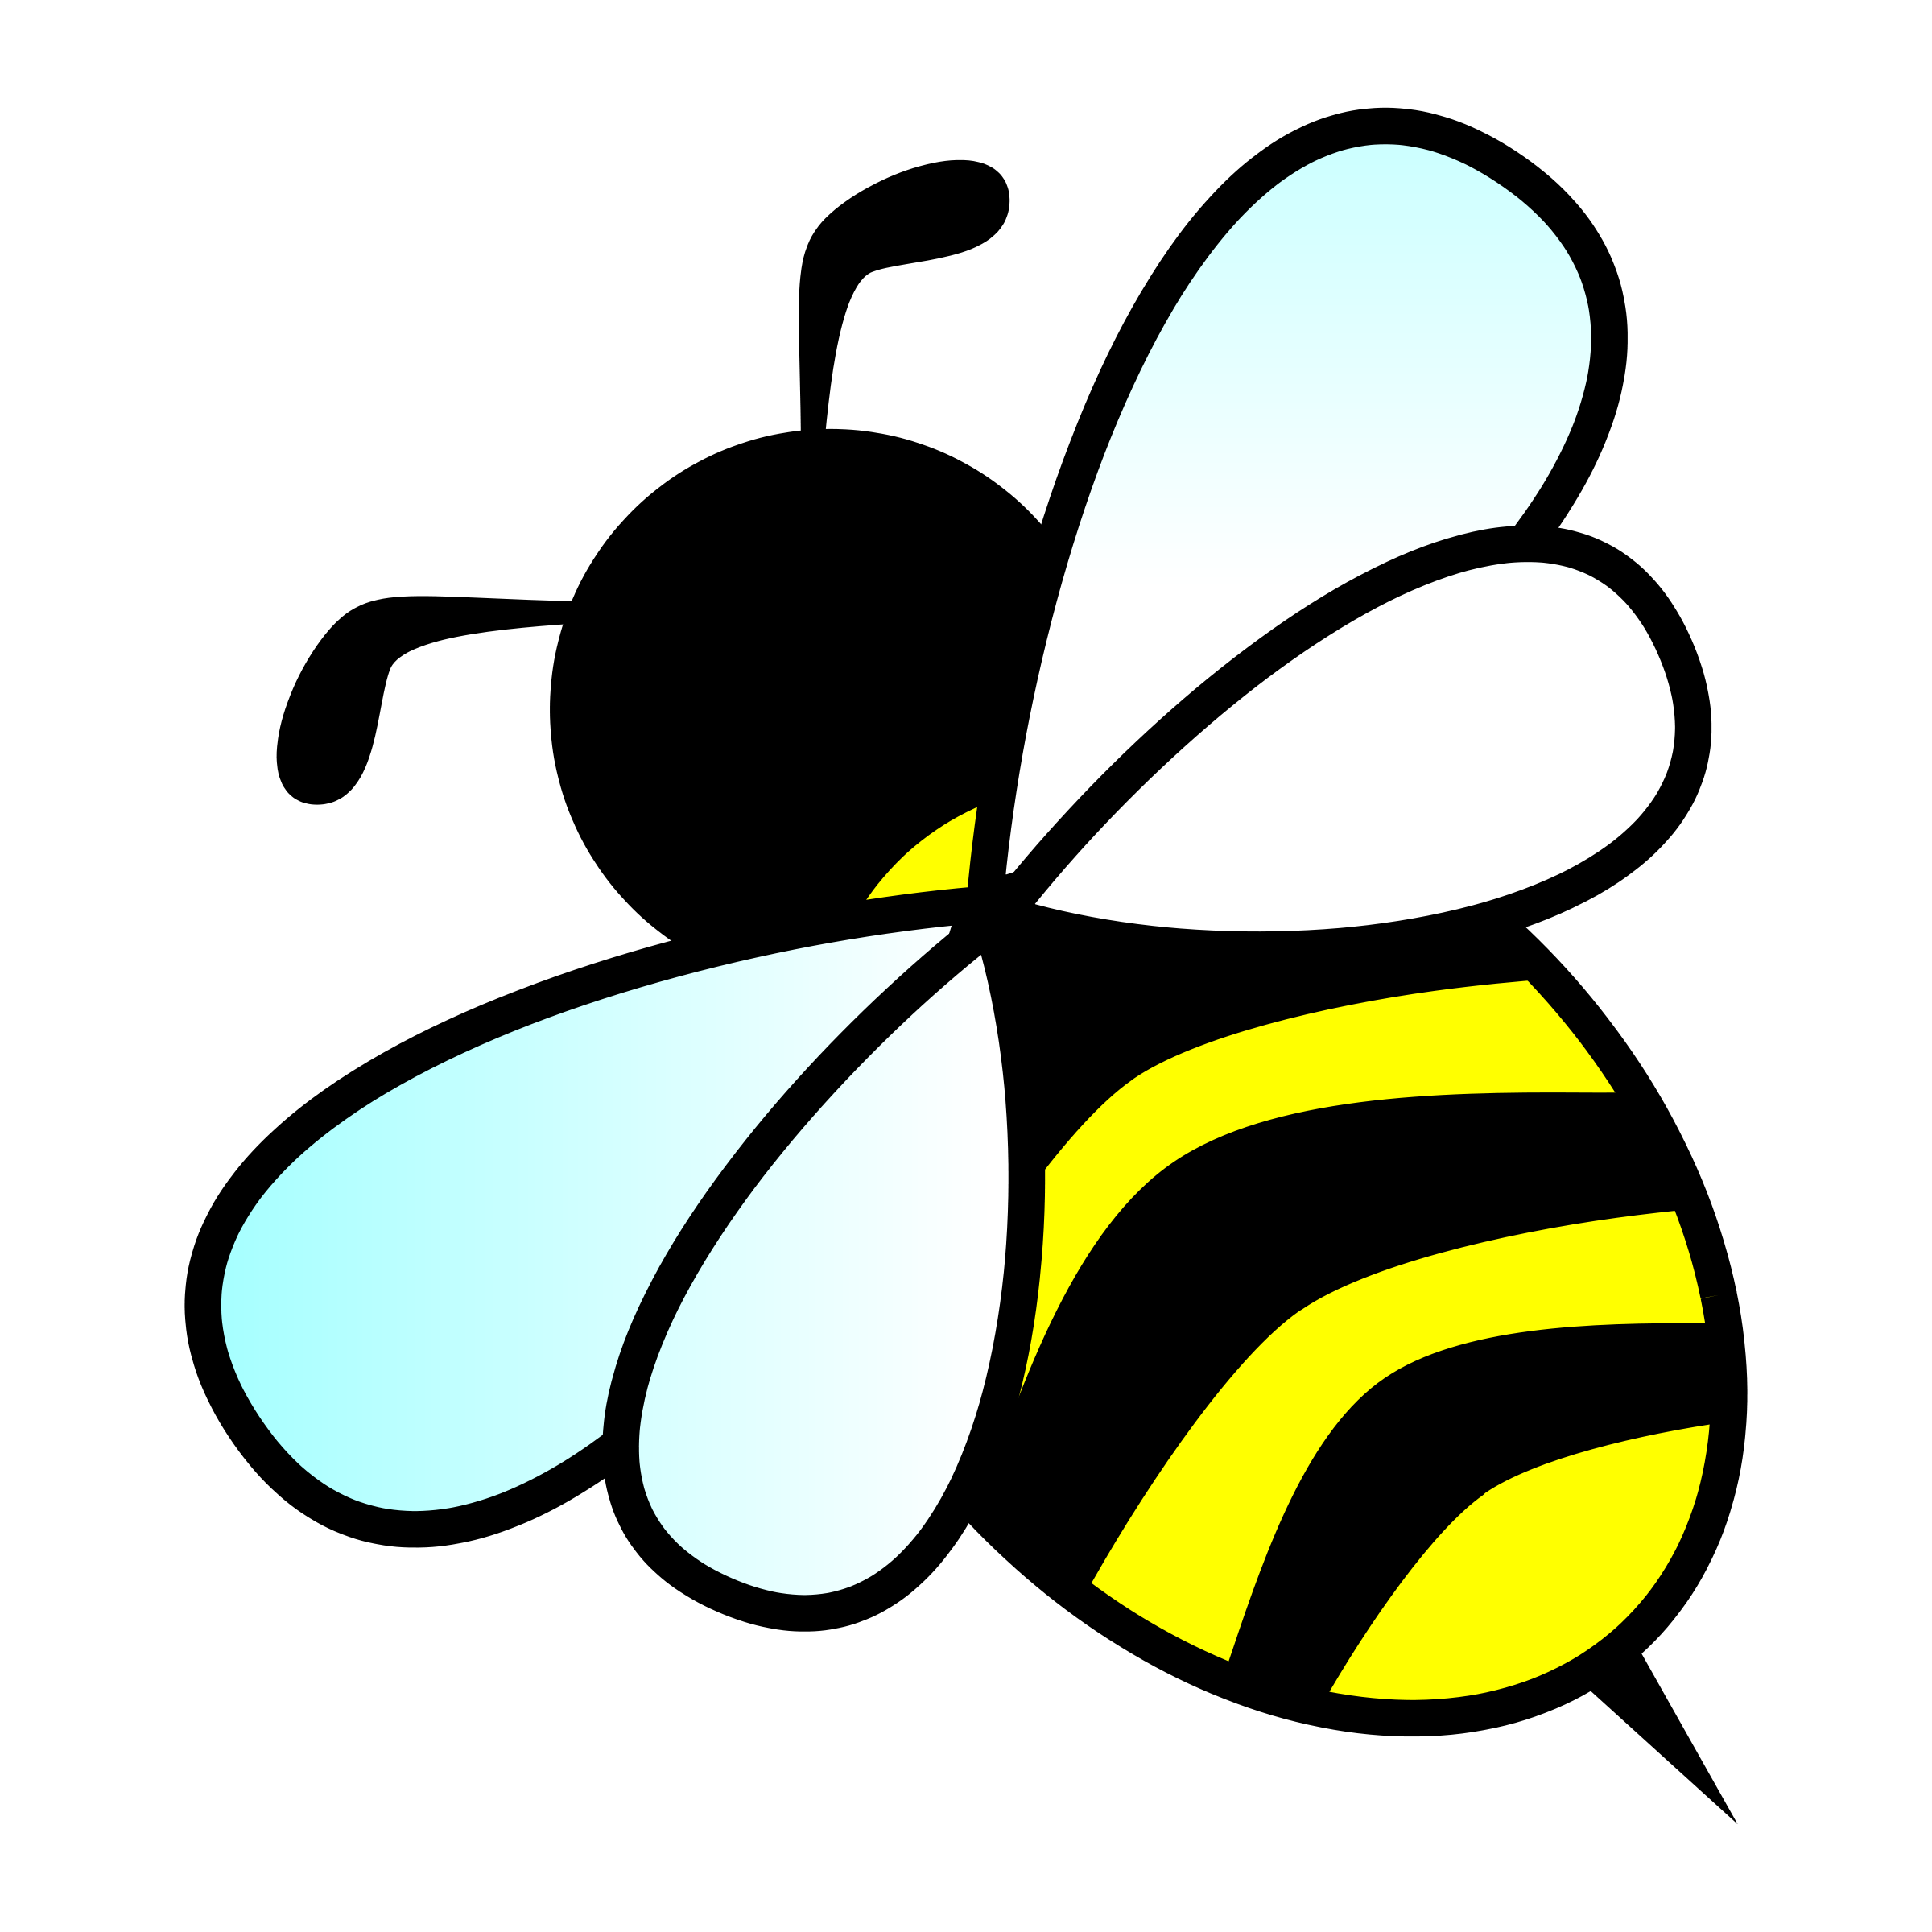 2400x2400 Bee Clipart Cartoon Images Download